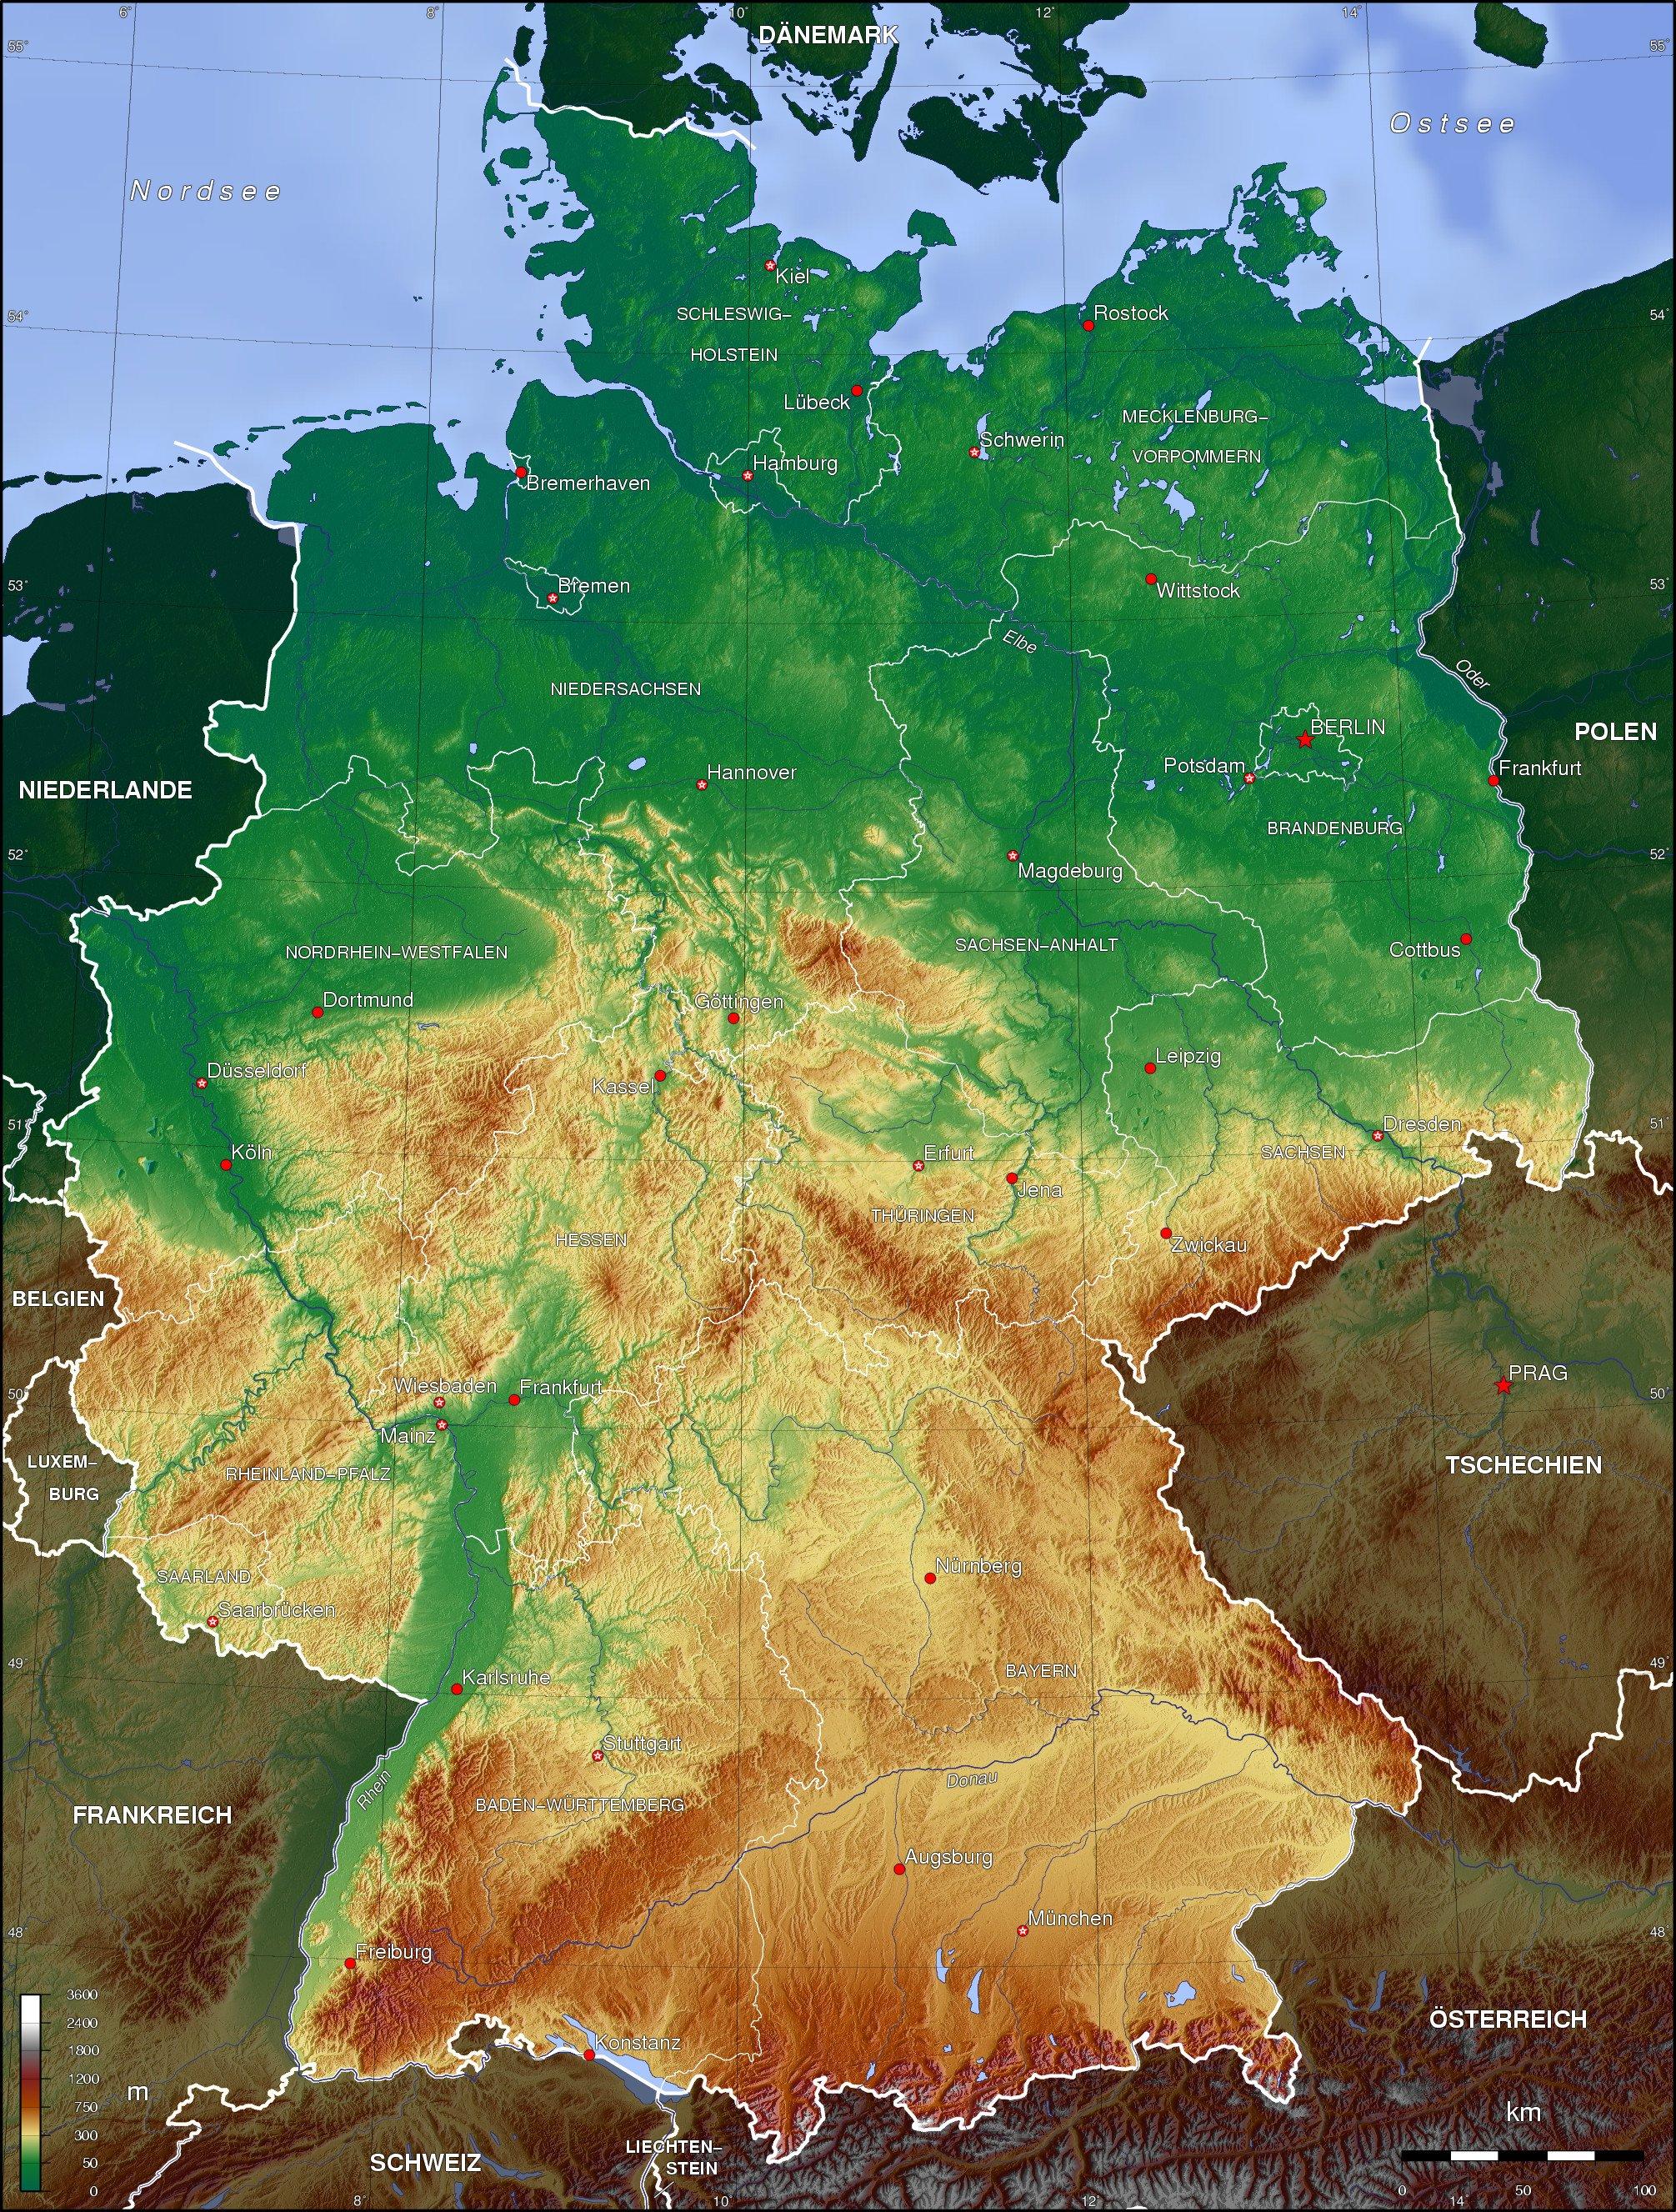 Germany Topographic Map Populationdata Net